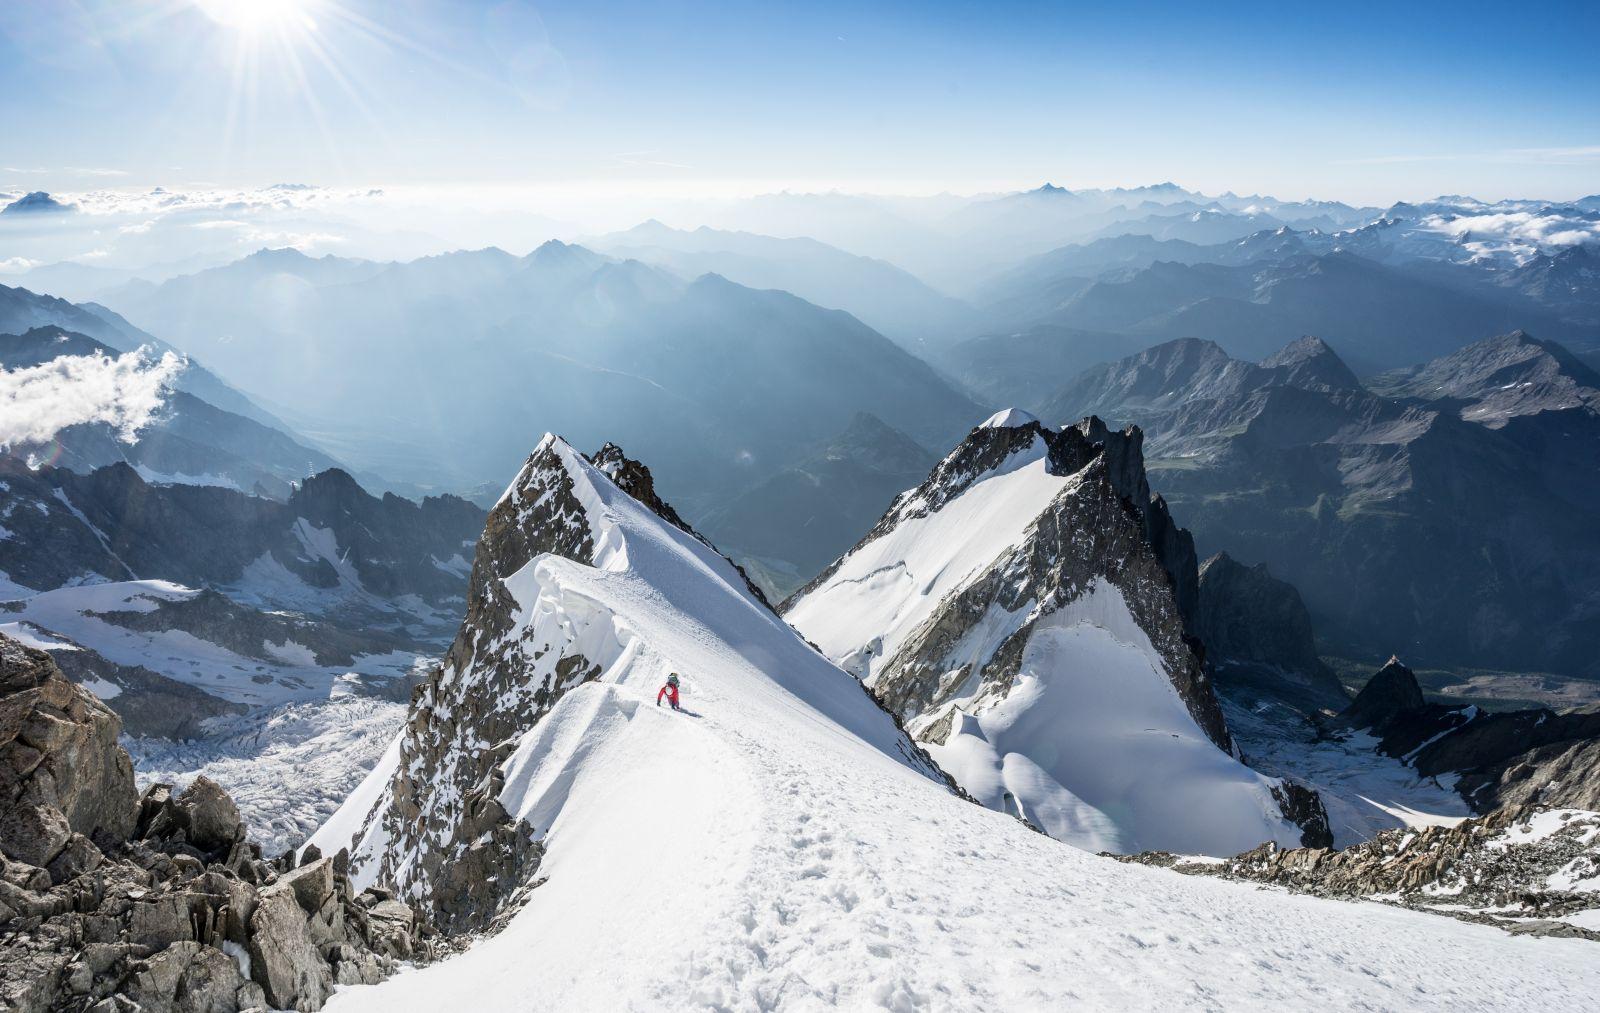 foto_andreas_lattner_peuterey-integral_mont_blanc_marlies_czerny